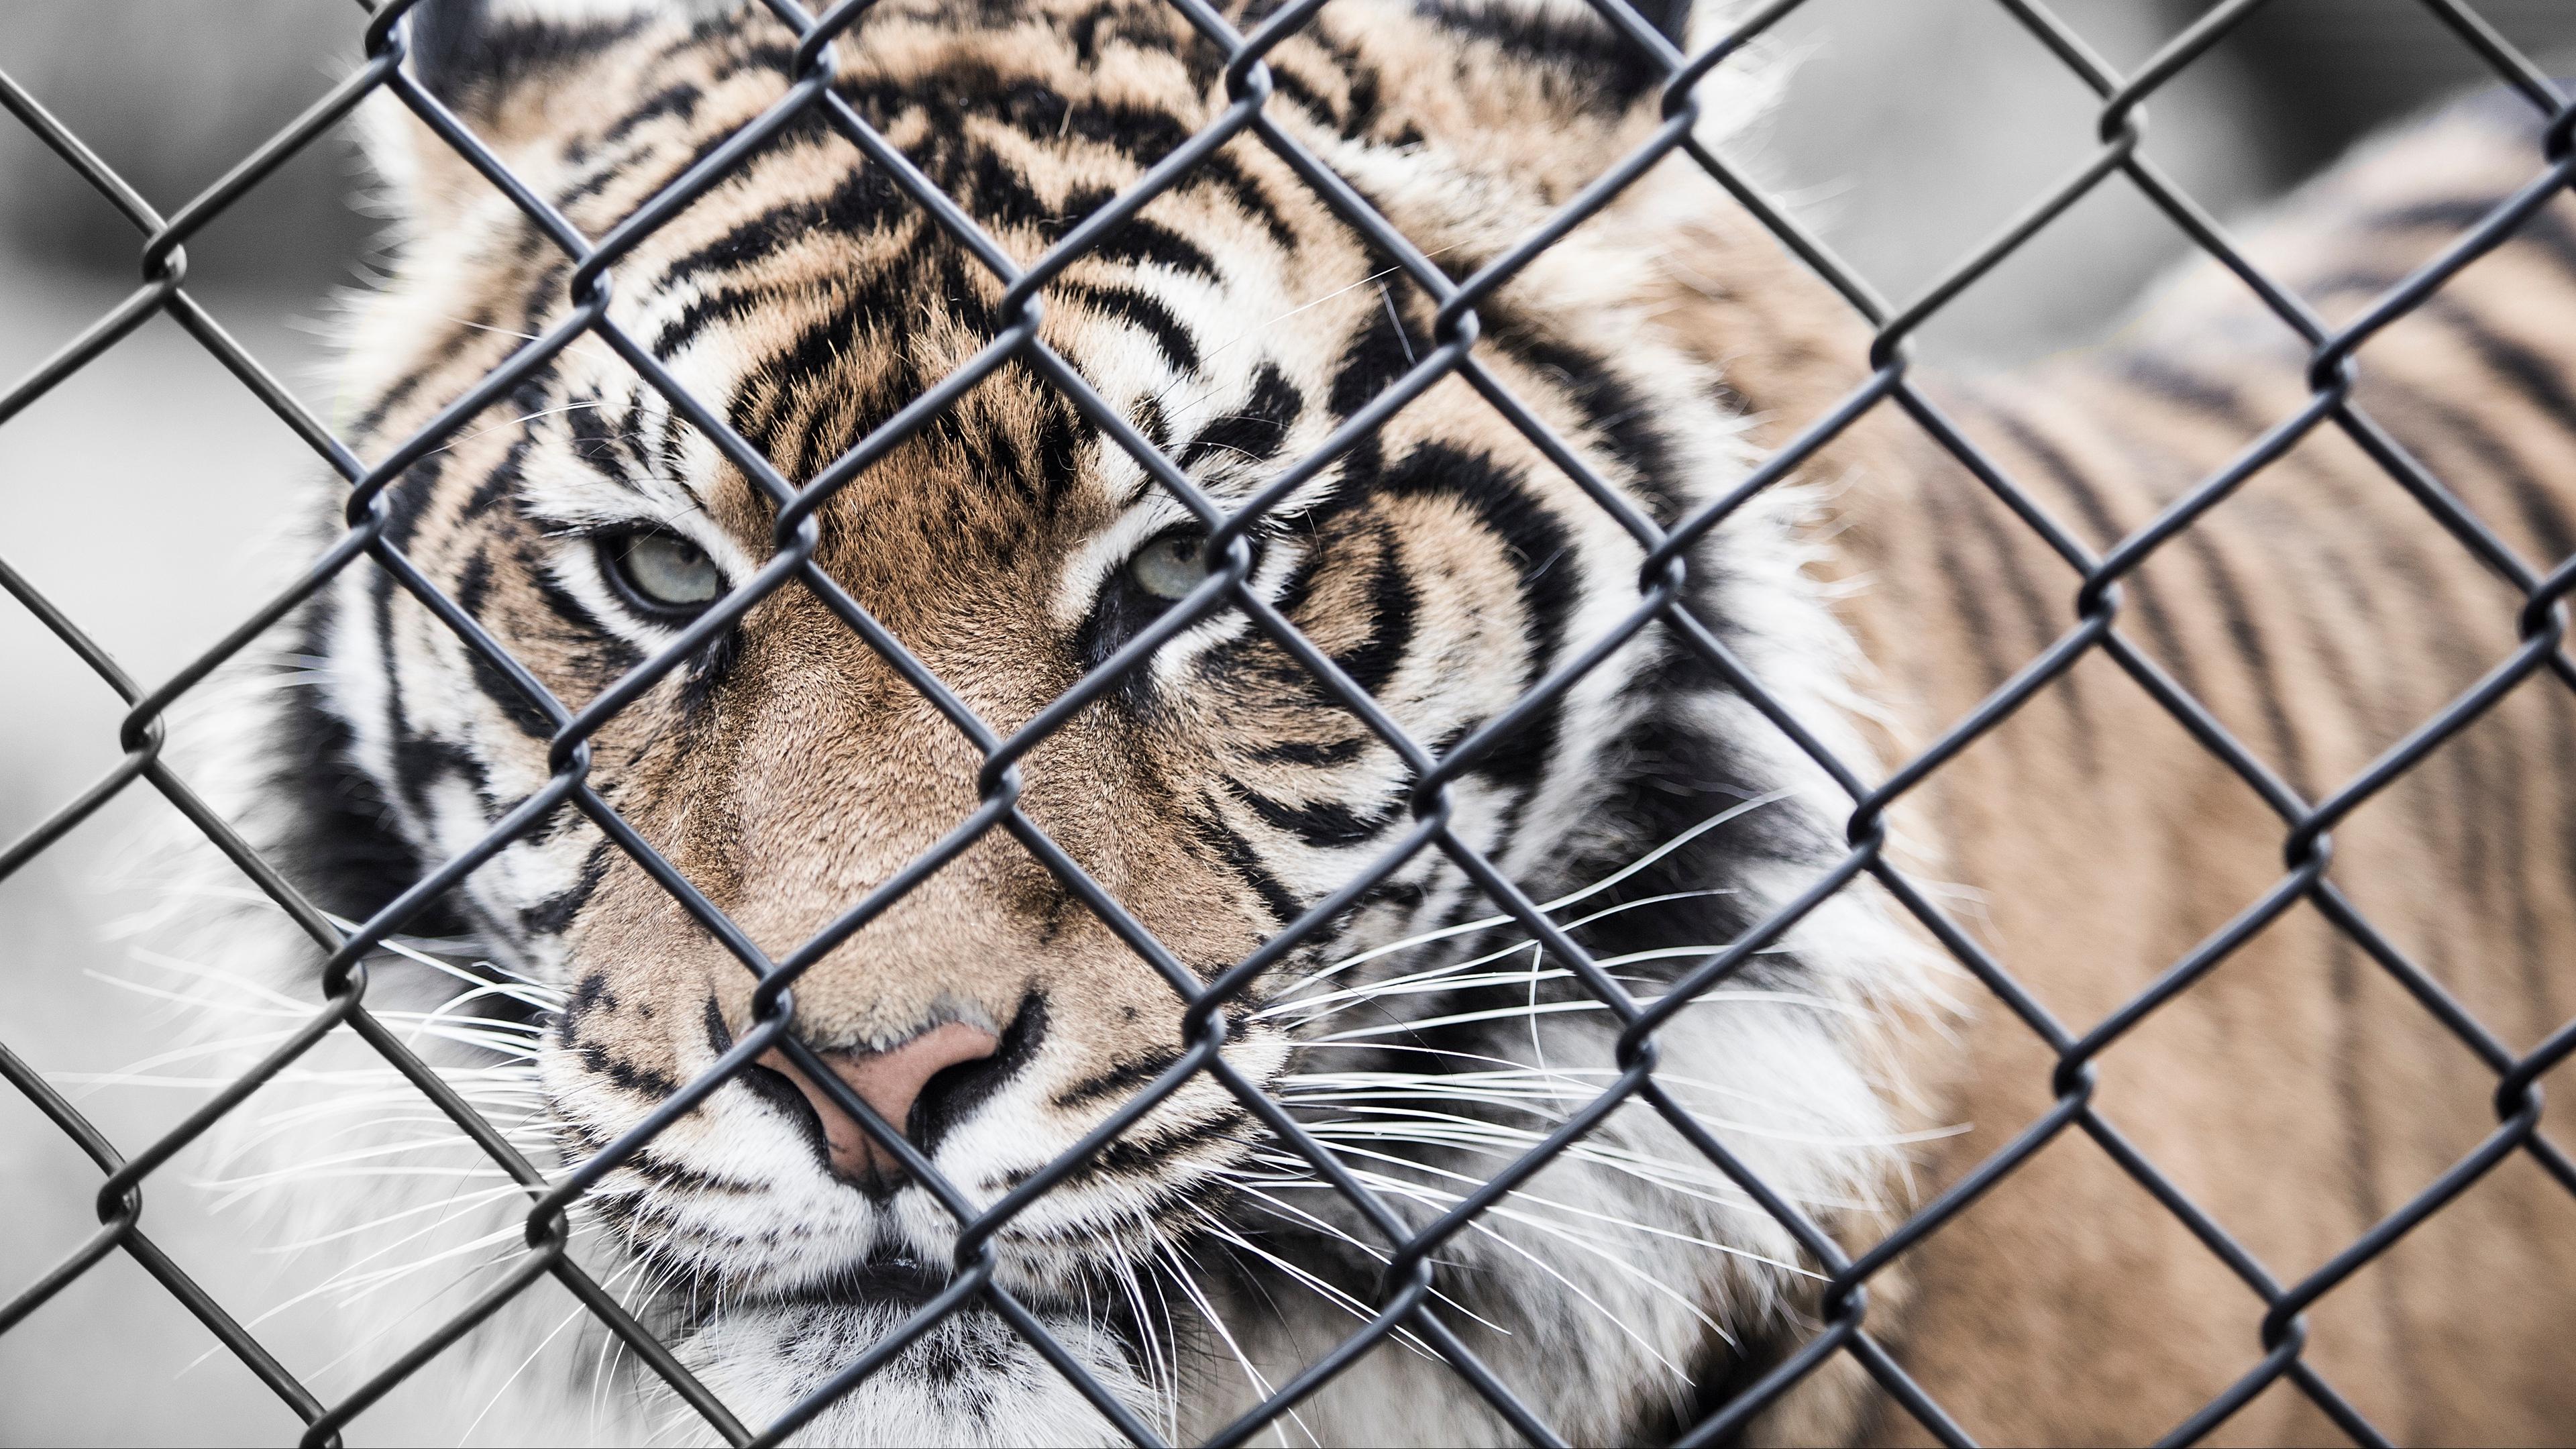 tiger muzzle fence mesh 4k 1542242772 - tiger, muzzle, fence, mesh 4k - Tiger, muzzle, fence